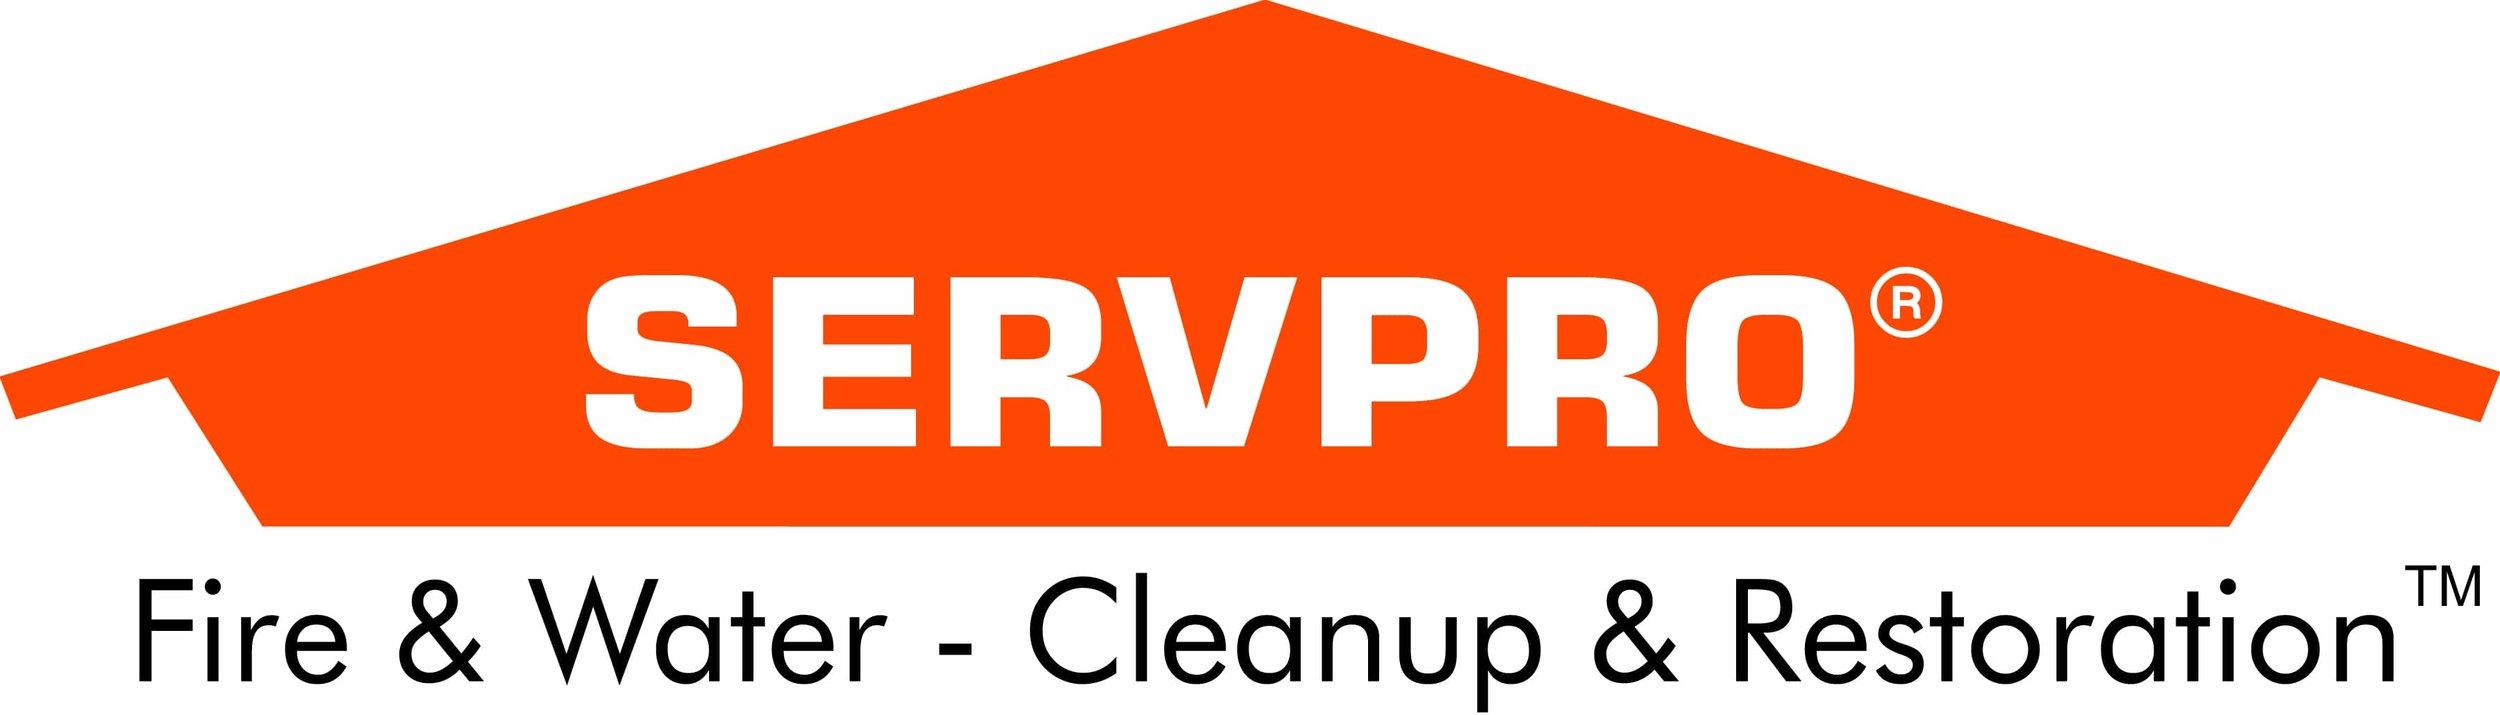 88792352_SERVPRO Logo large-min.jpg